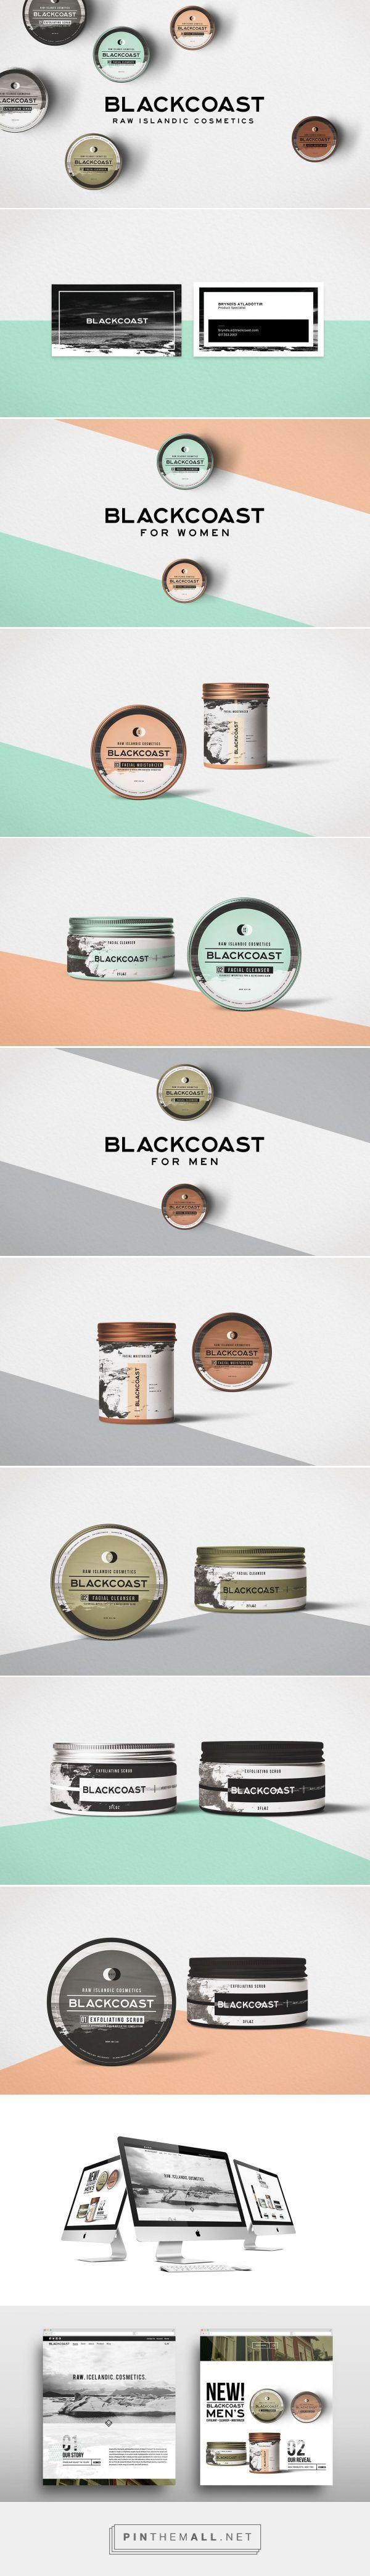 Blackcoast Raw Islandics Cosmetic Branding and Packaging by BADD Design | Fivestar Branding Agency – Design and Branding Agency & Curated Inspiration Gallery